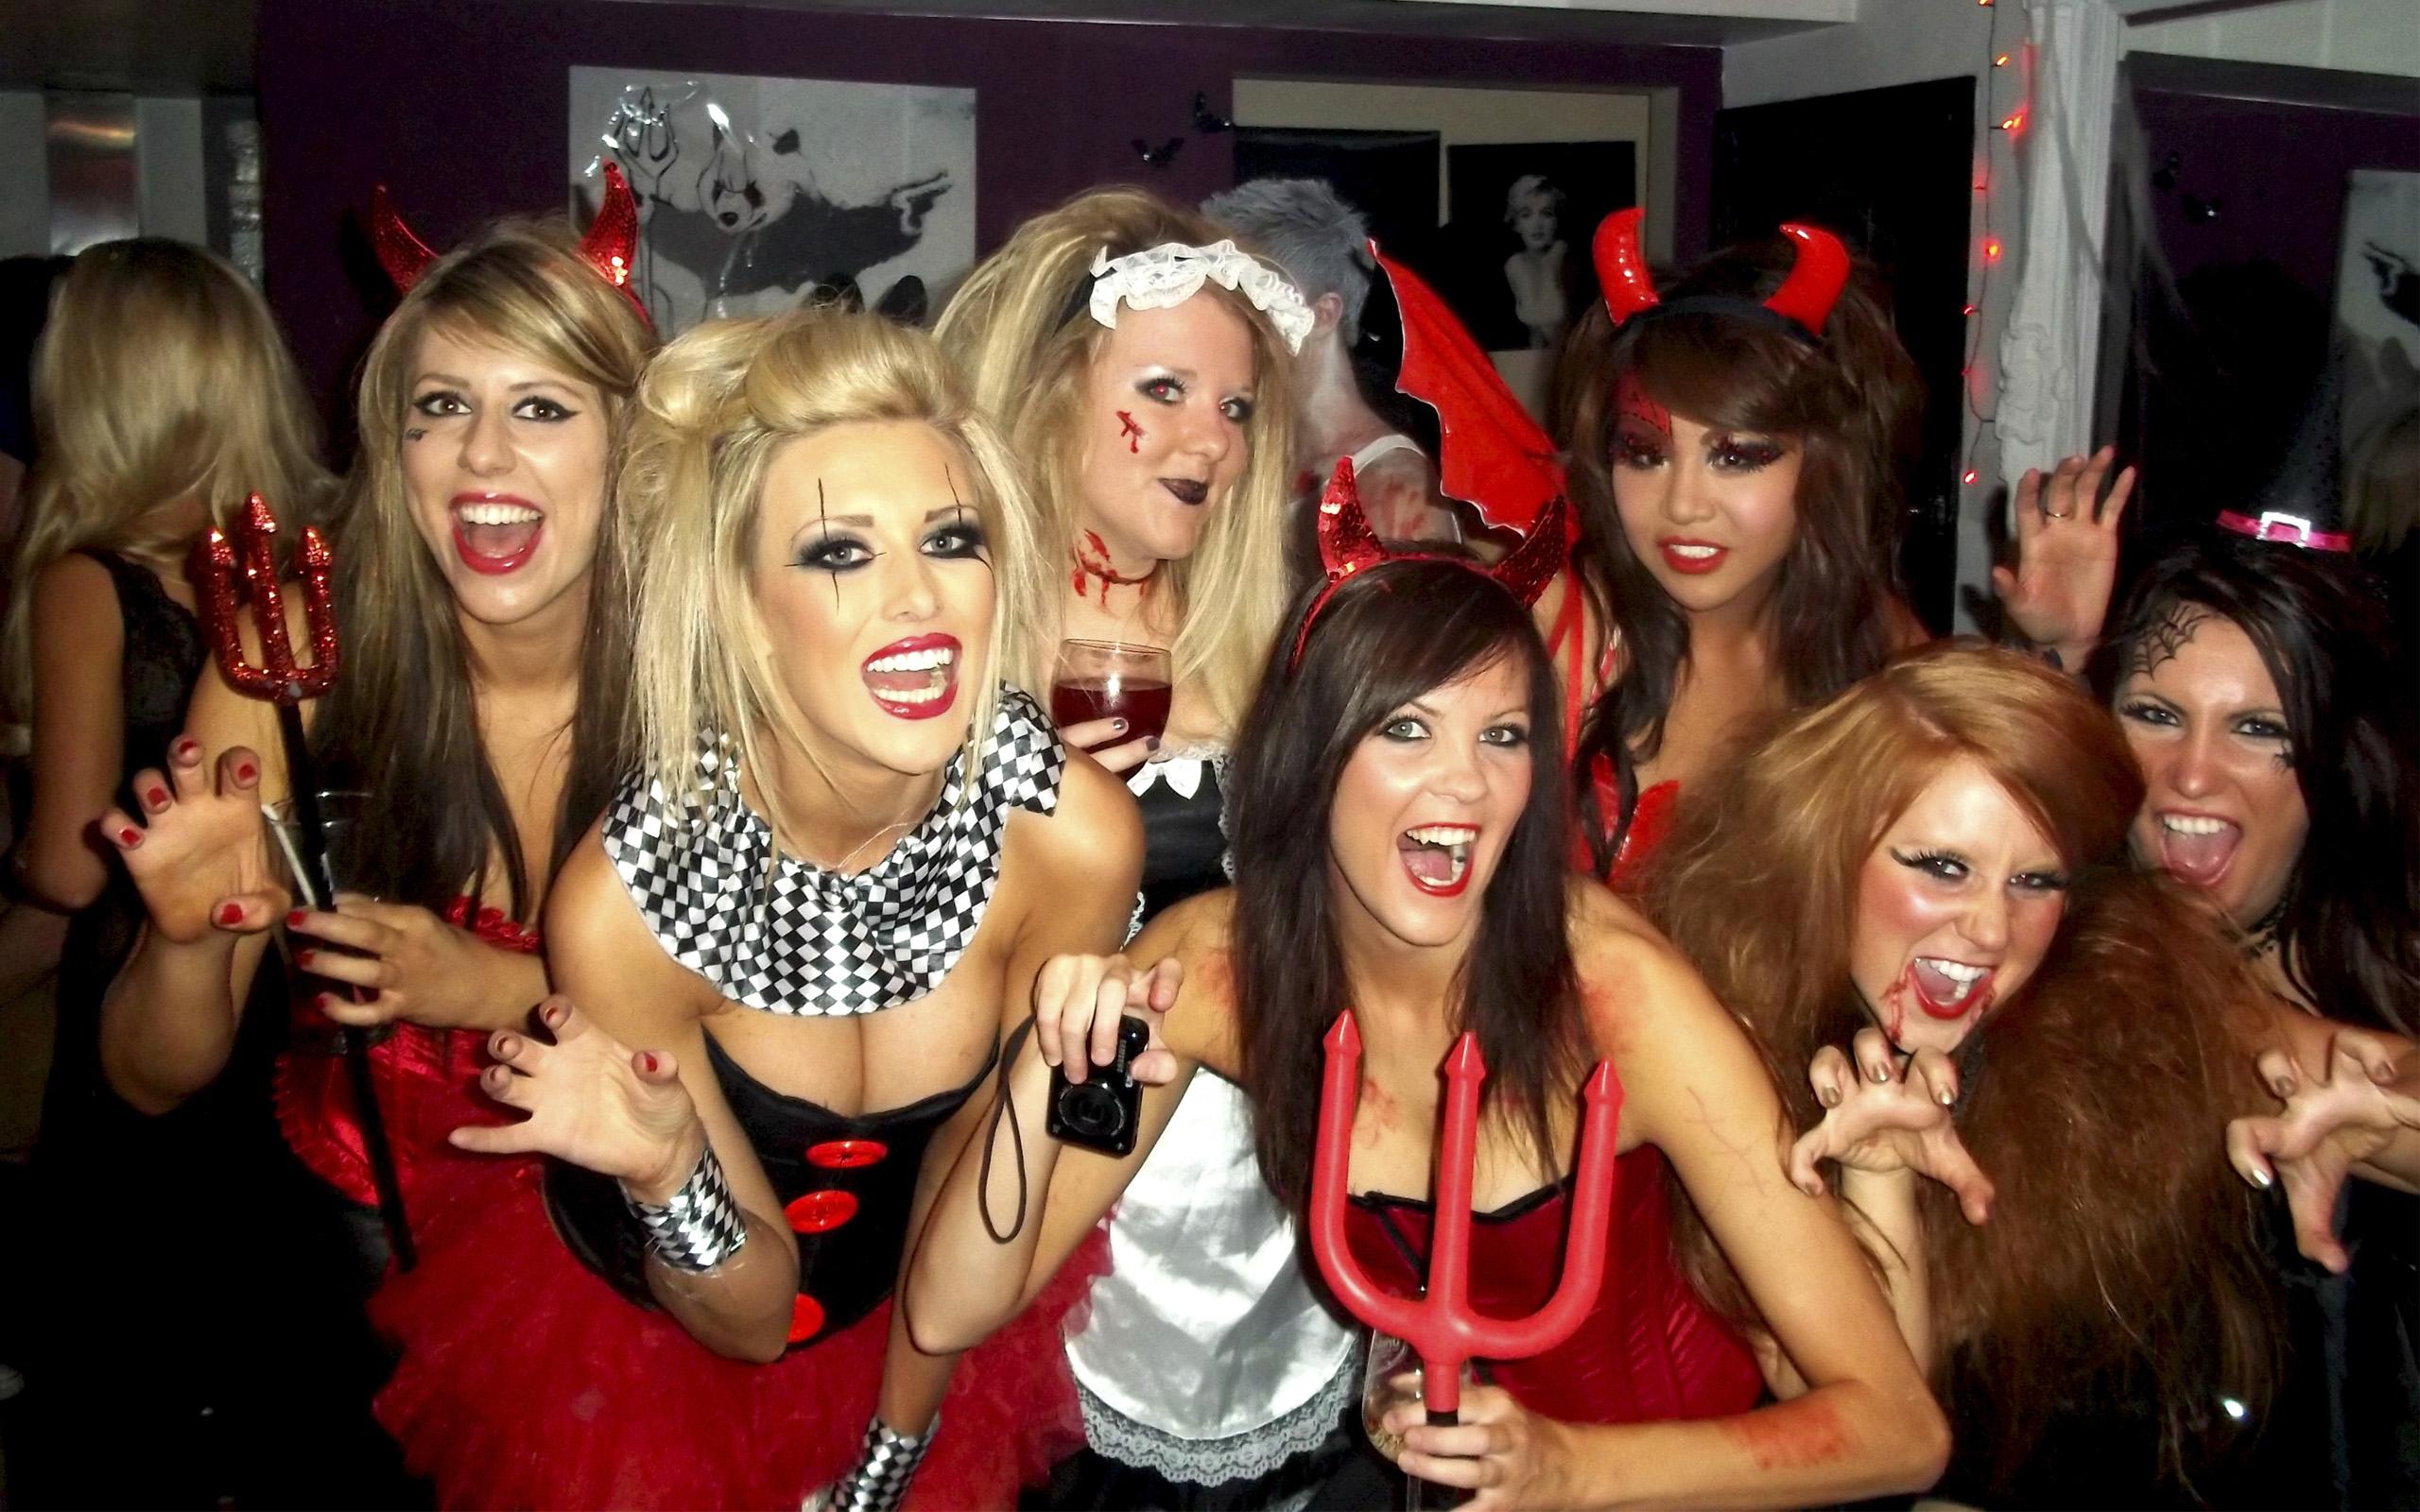 Disfraces para halloween - 2560x1600